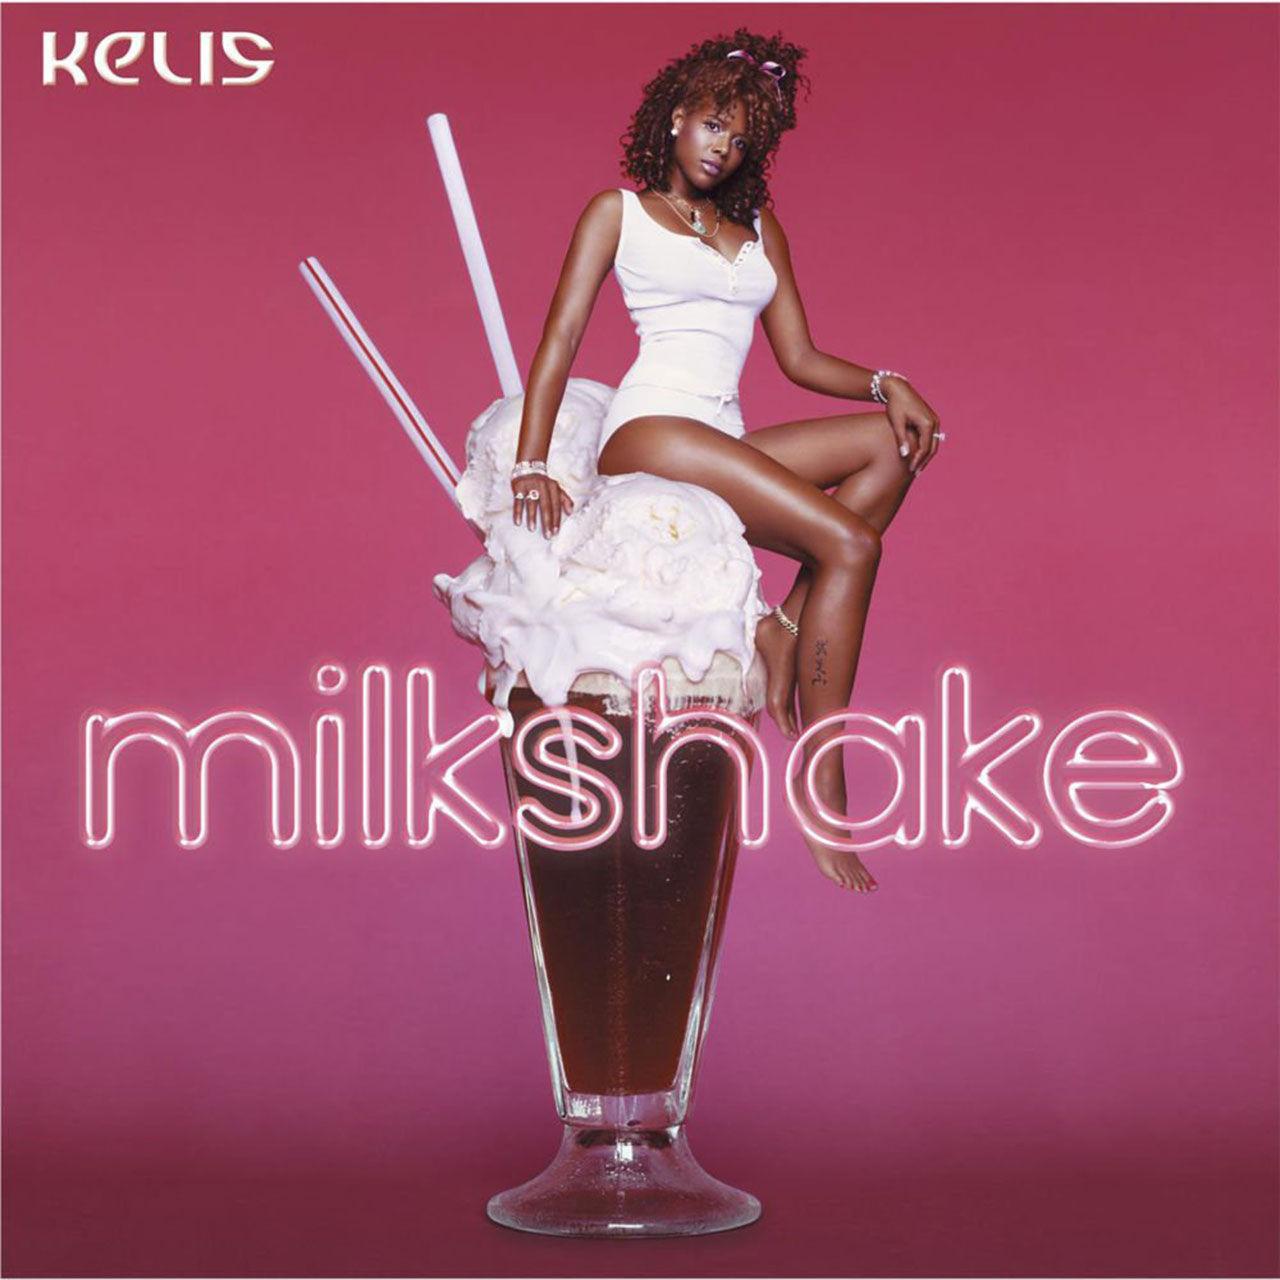 Så gör du Kelis omtalade milkshake